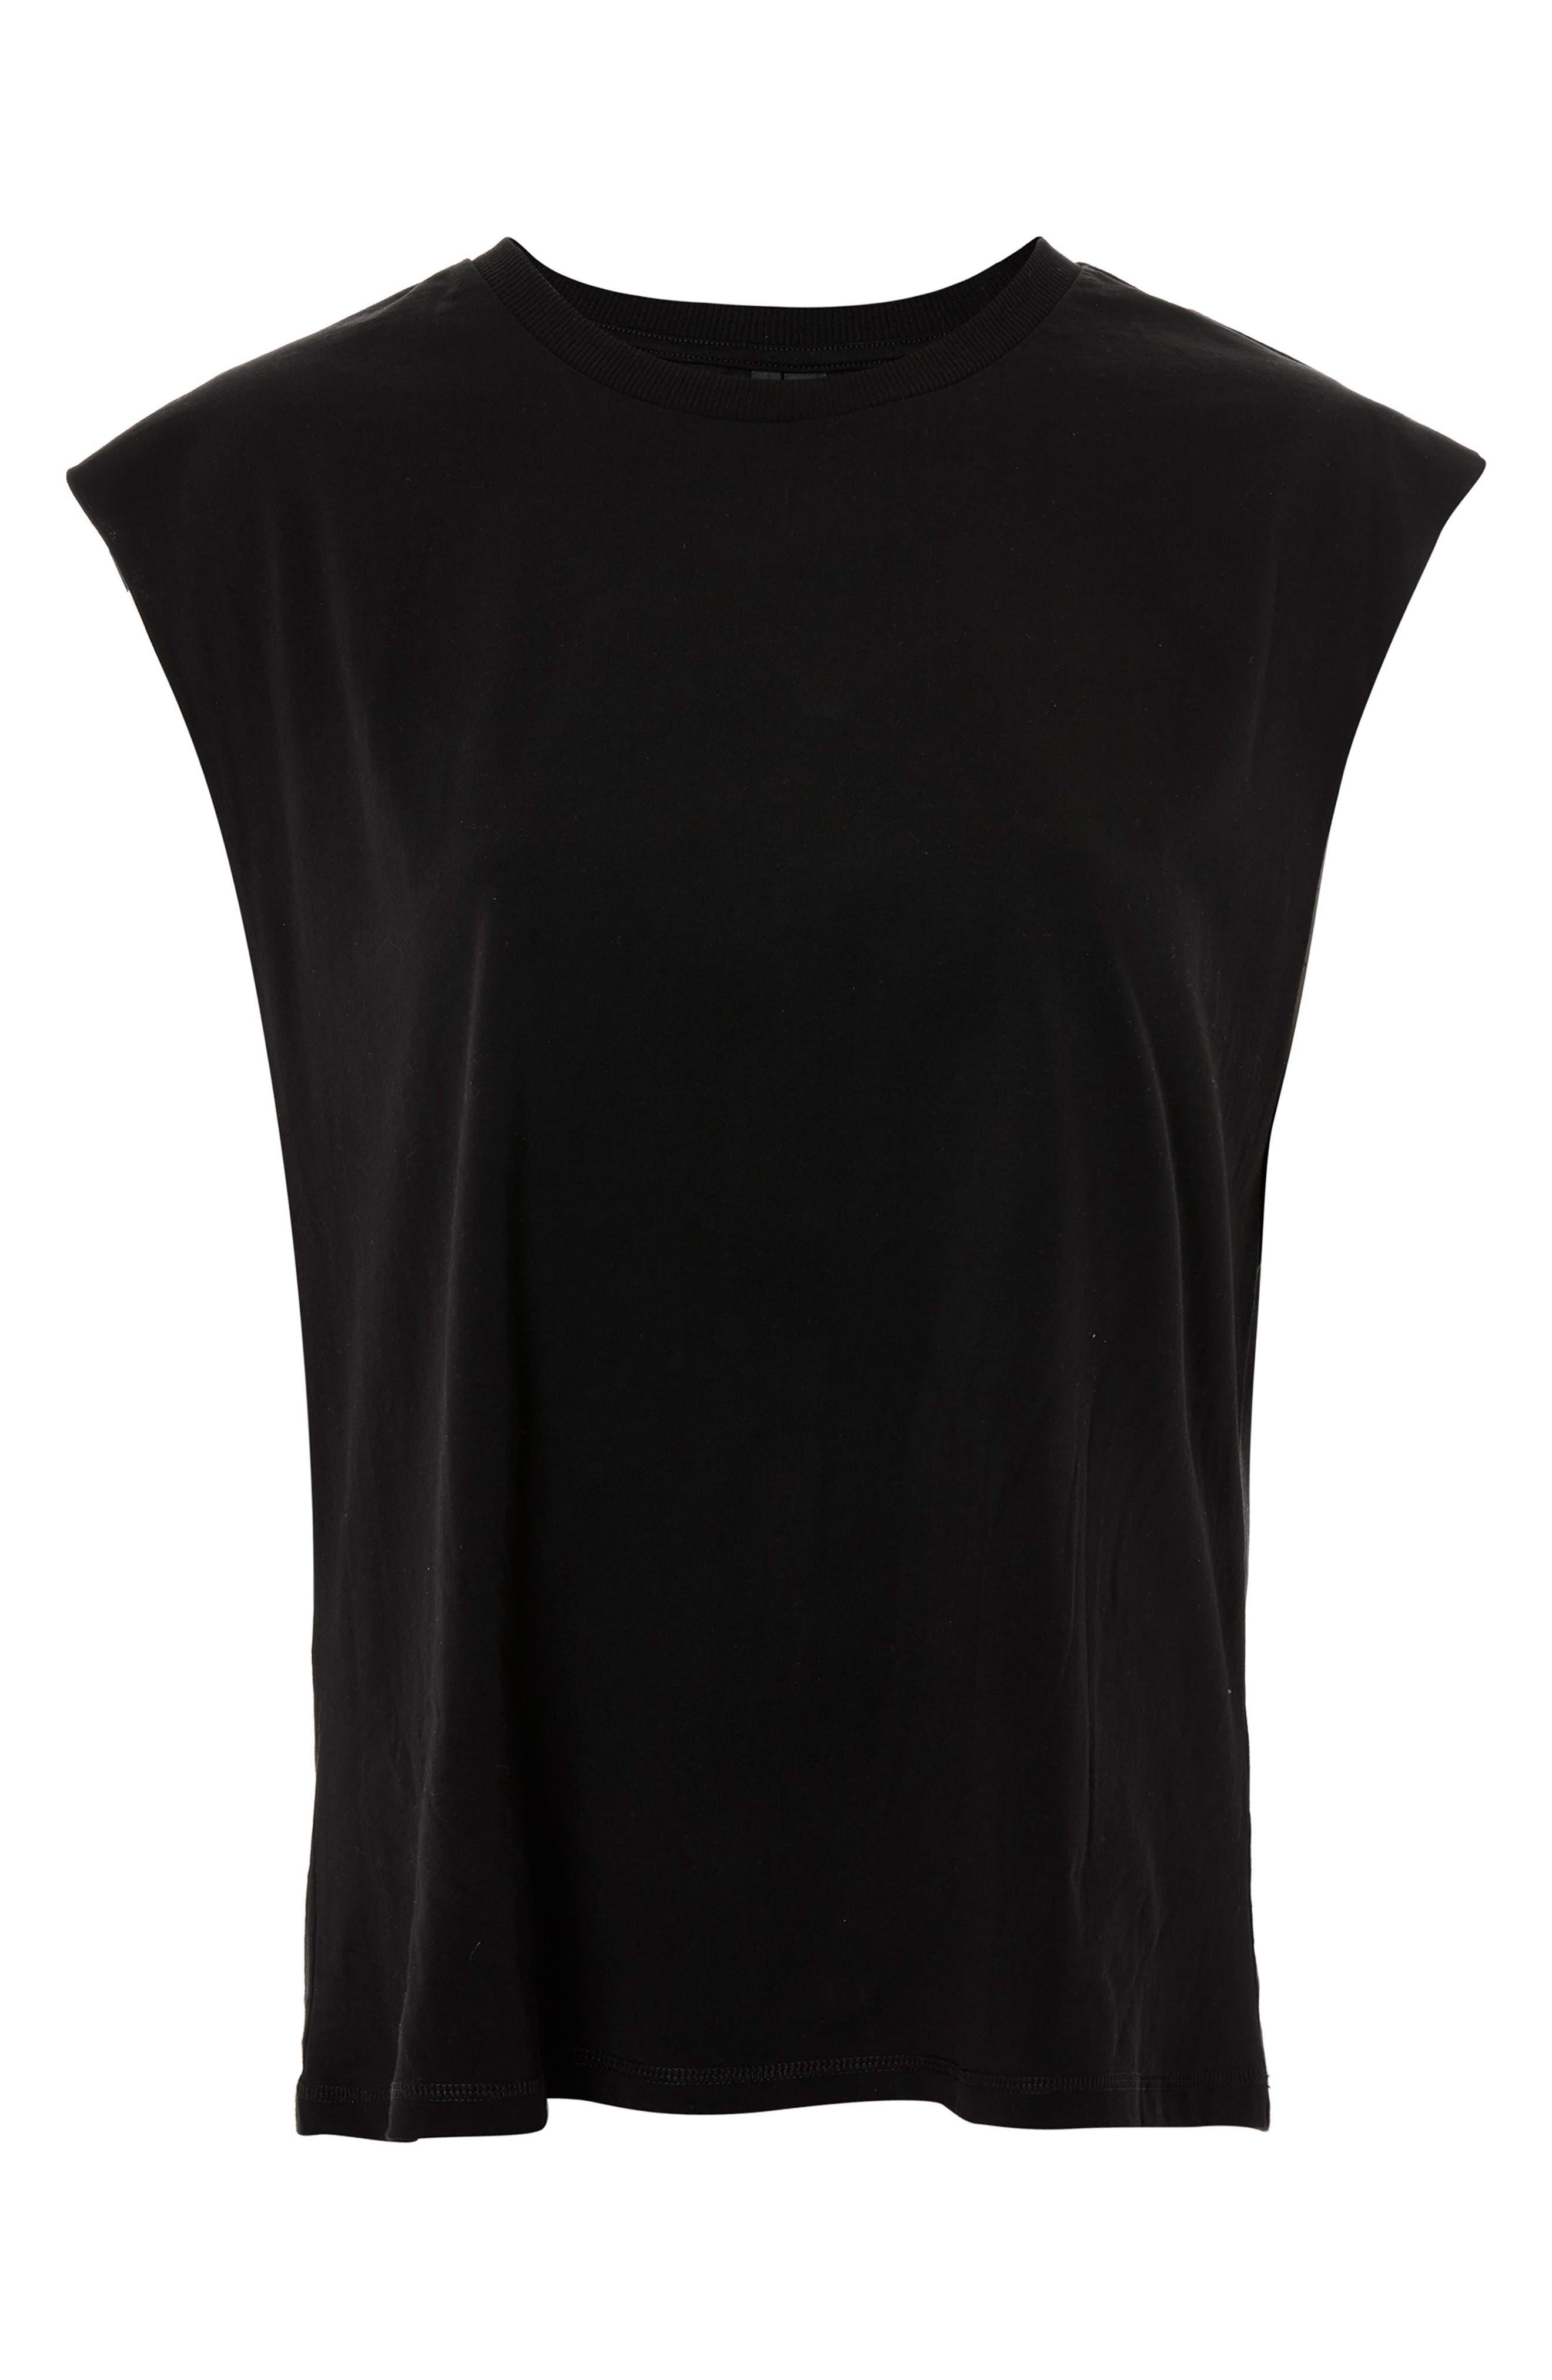 Raw Sleeve Top,                         Main,                         color, Black